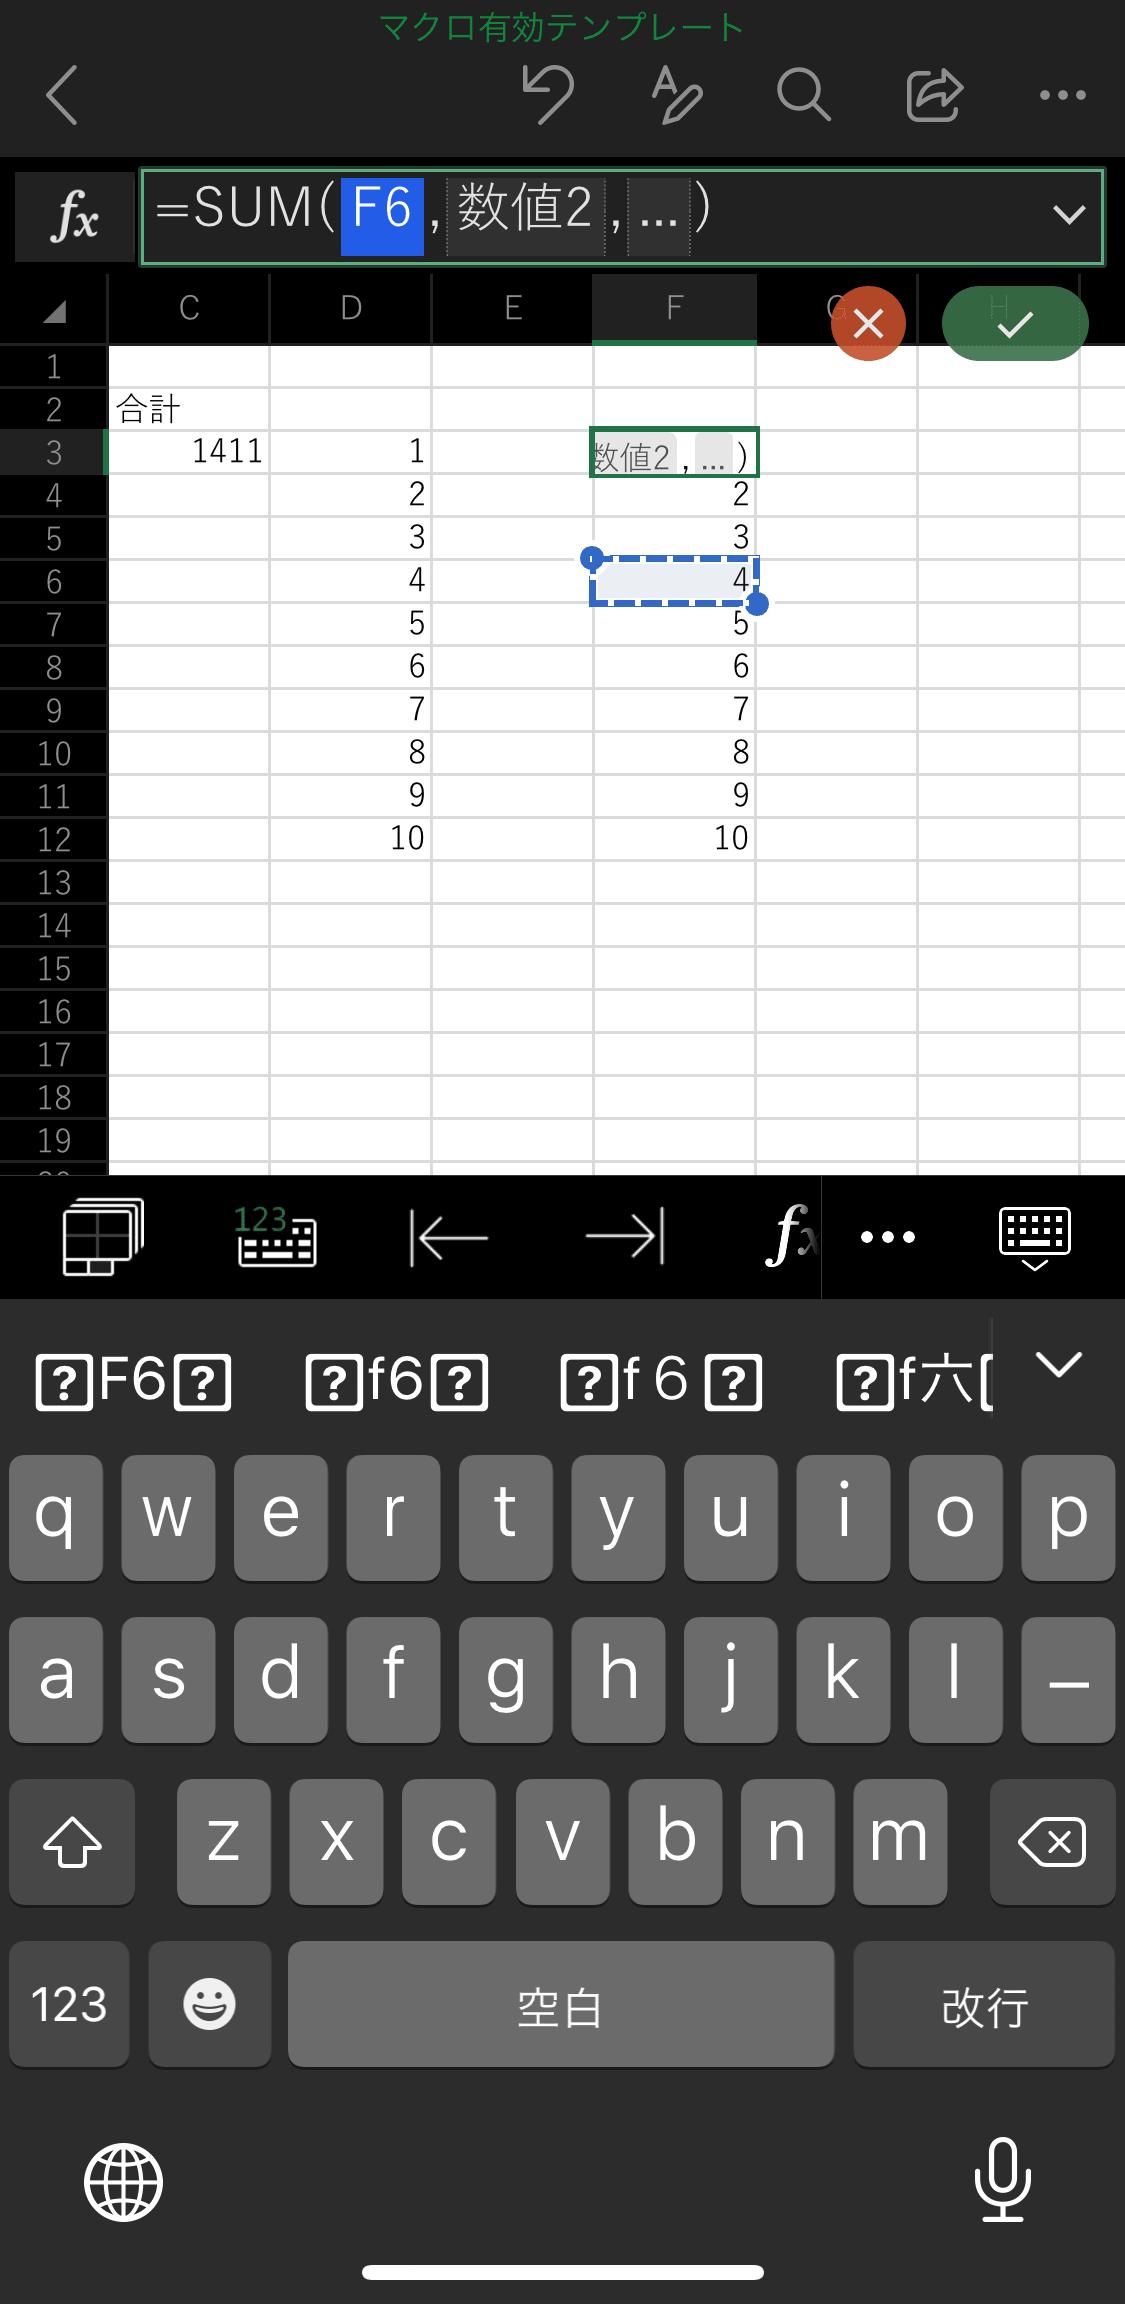 iPhoneでのエクセルアプリの使い方・編集方法・保存方法2